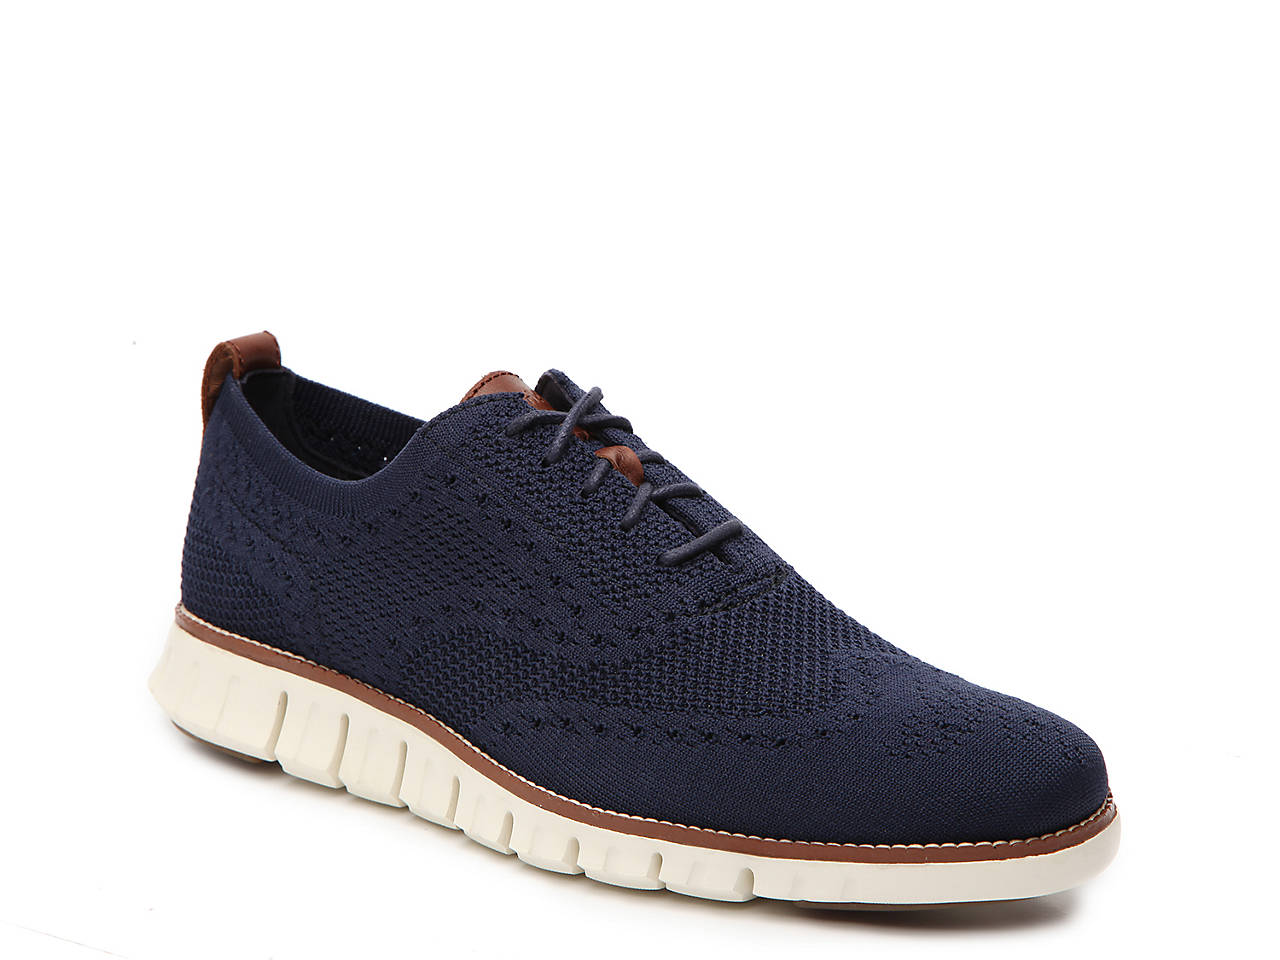 Cole Haan Zerogrand Stitchlite Wingtip Oxford Men\'s Shoes | DSW